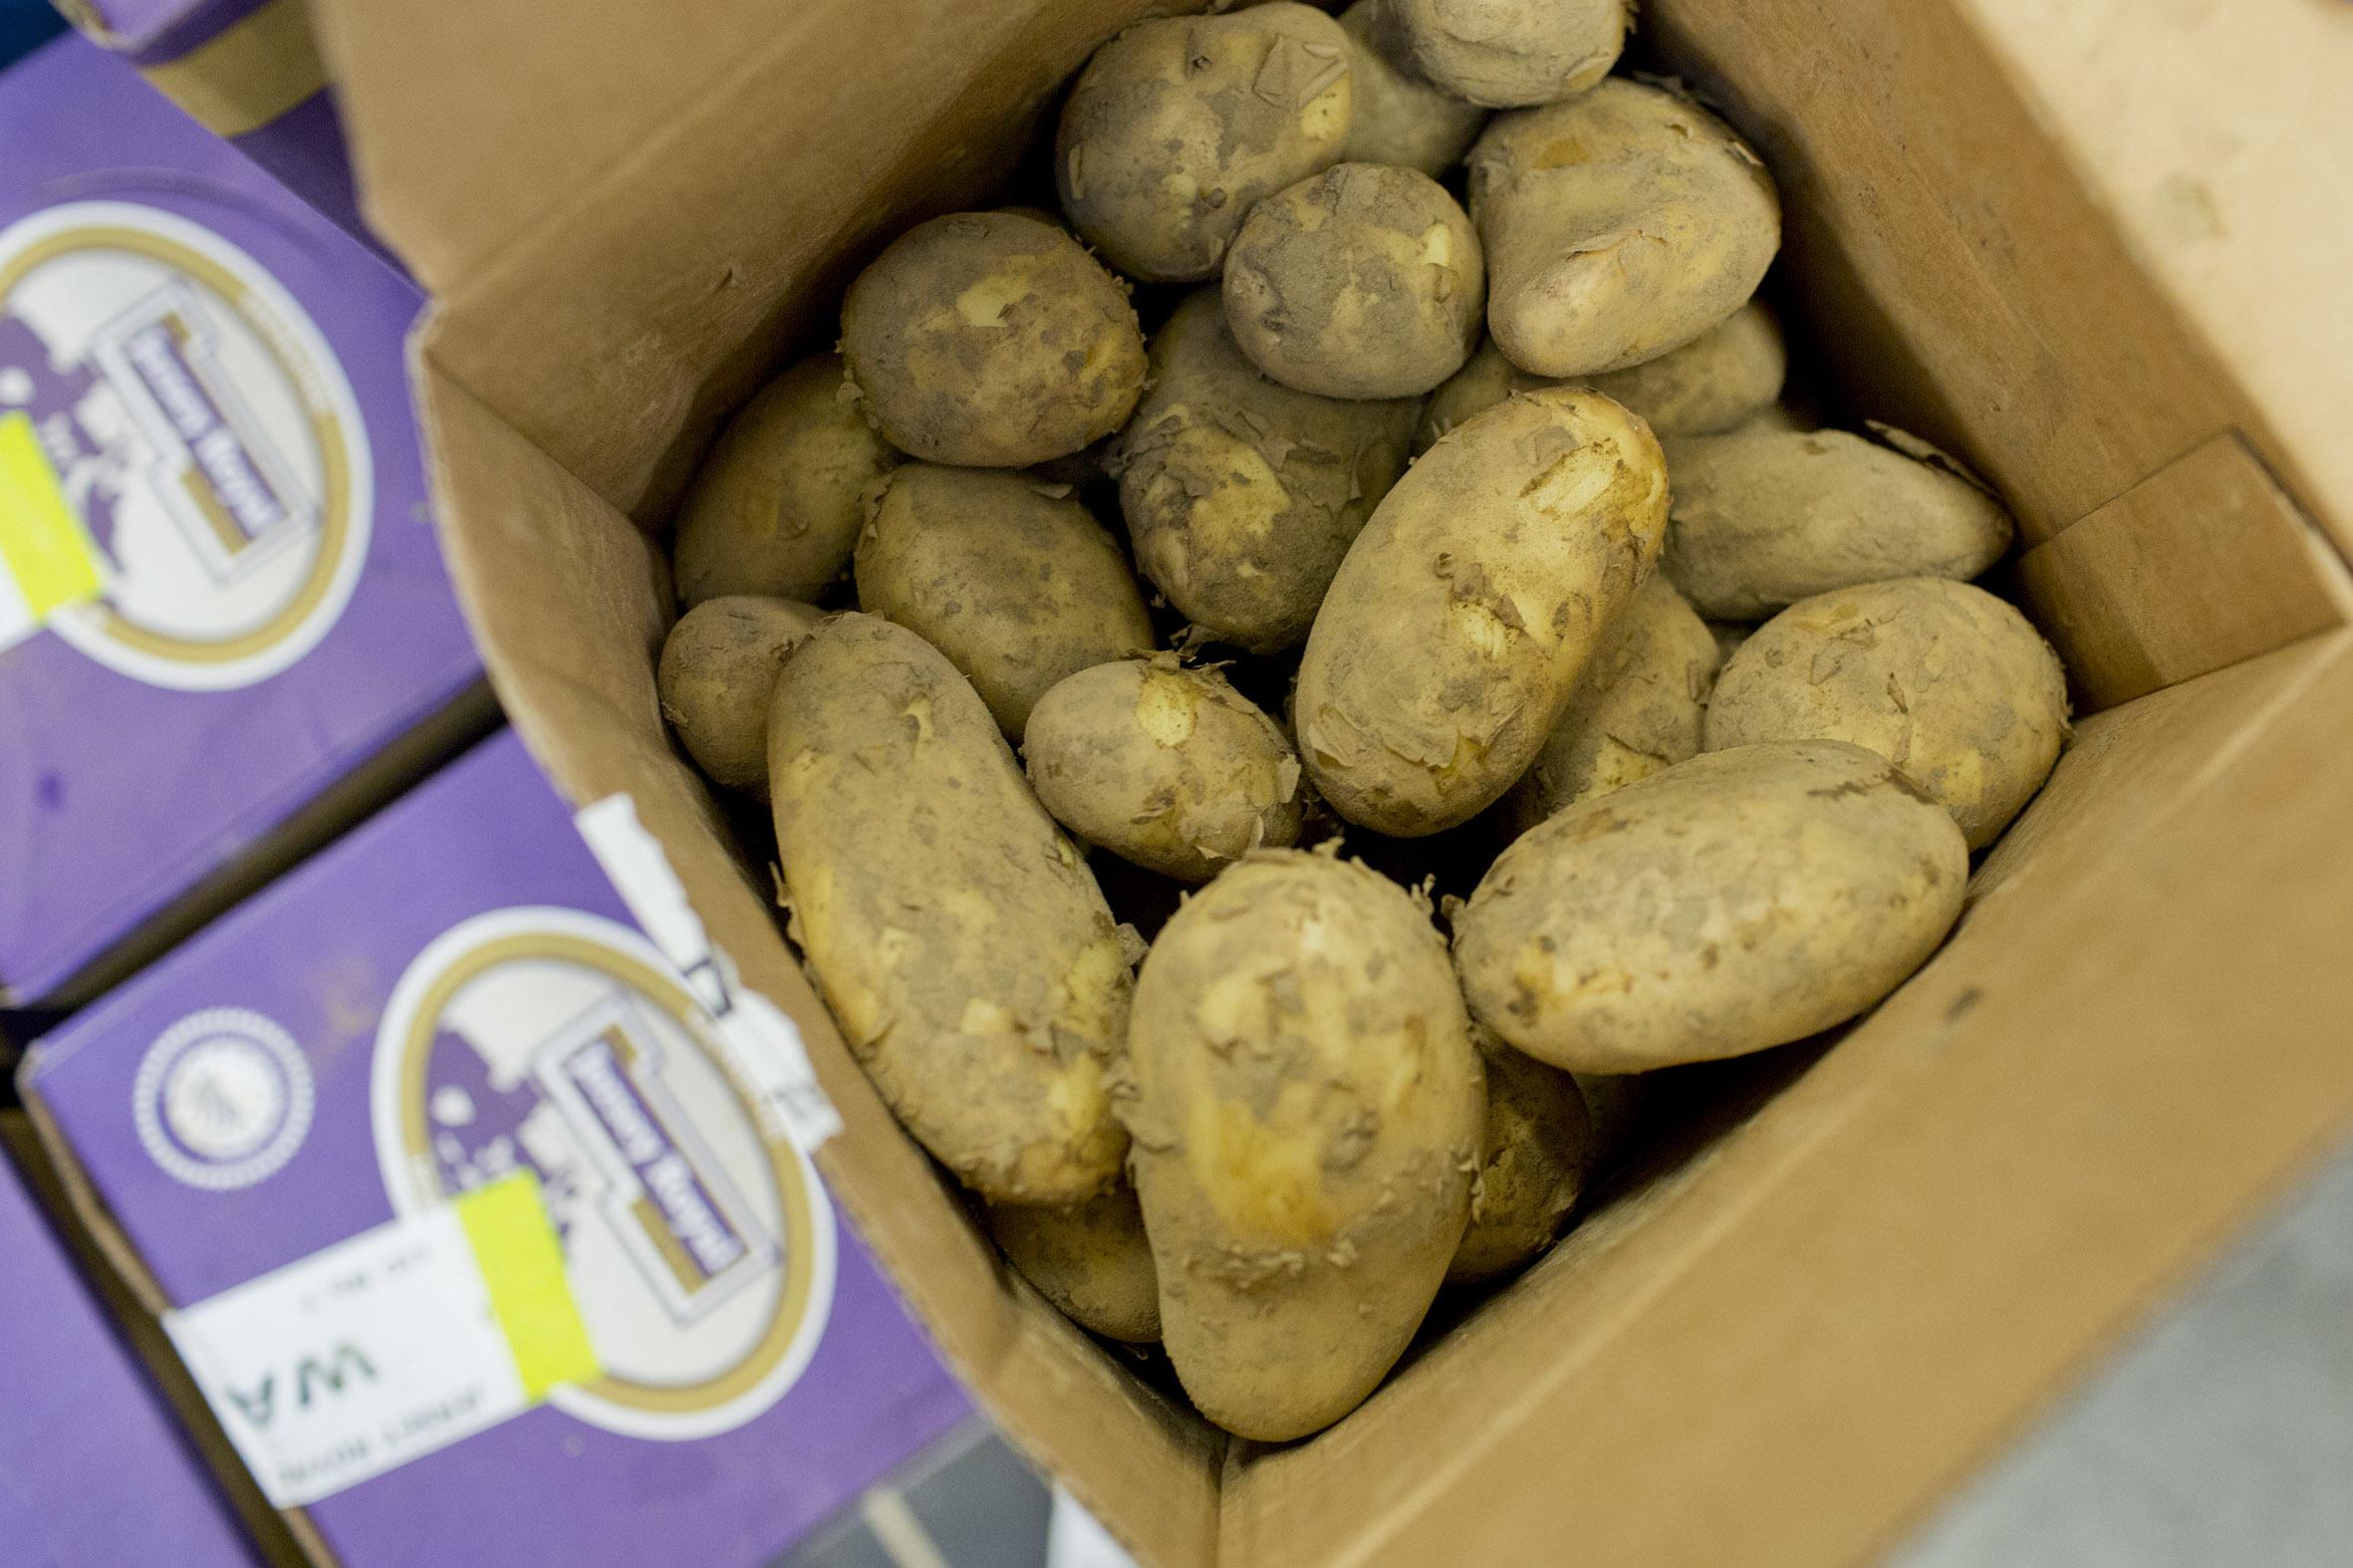 Fruit And Vegetable Market Report April 2014 Jersey Royals